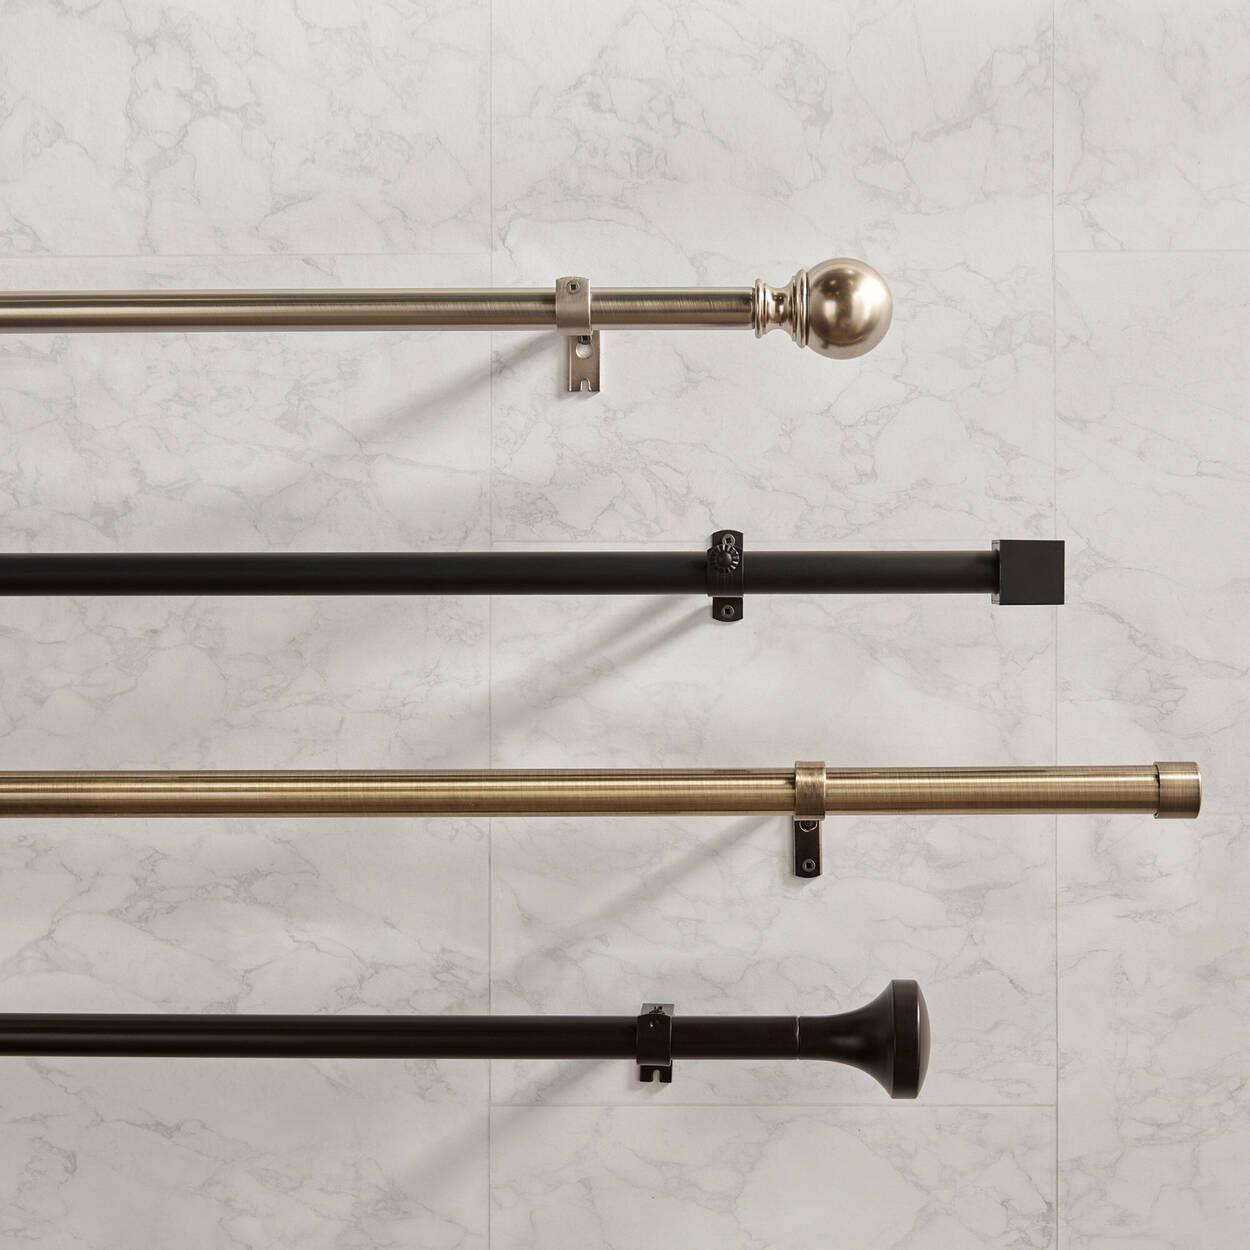 Curtain Rod Set - Diameter 16mm